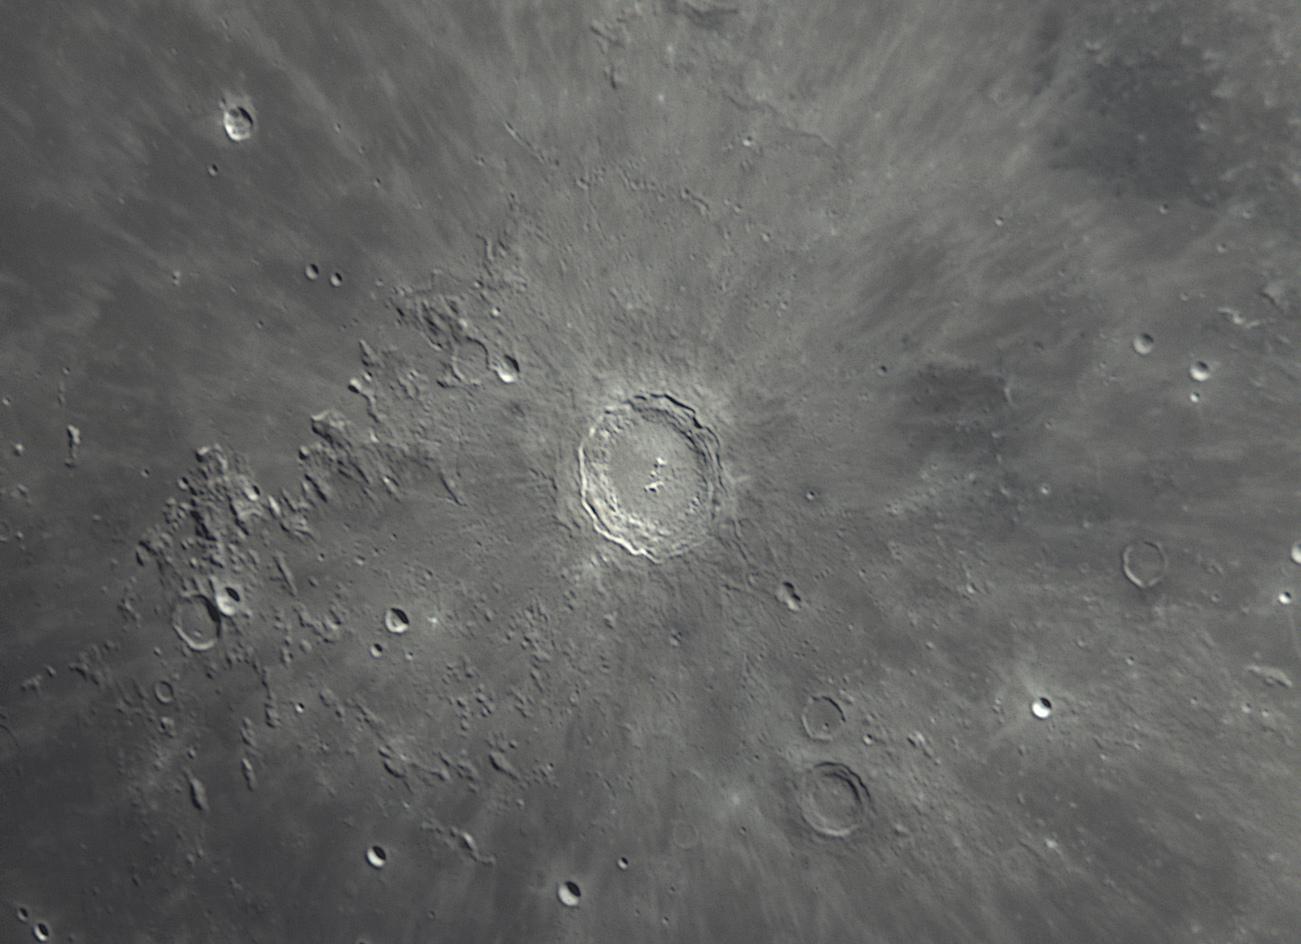 5ce01596587ba_Copernicbarlowx2.jpg.f24b6947304b02a44155cf2734f2bc5d.jpg